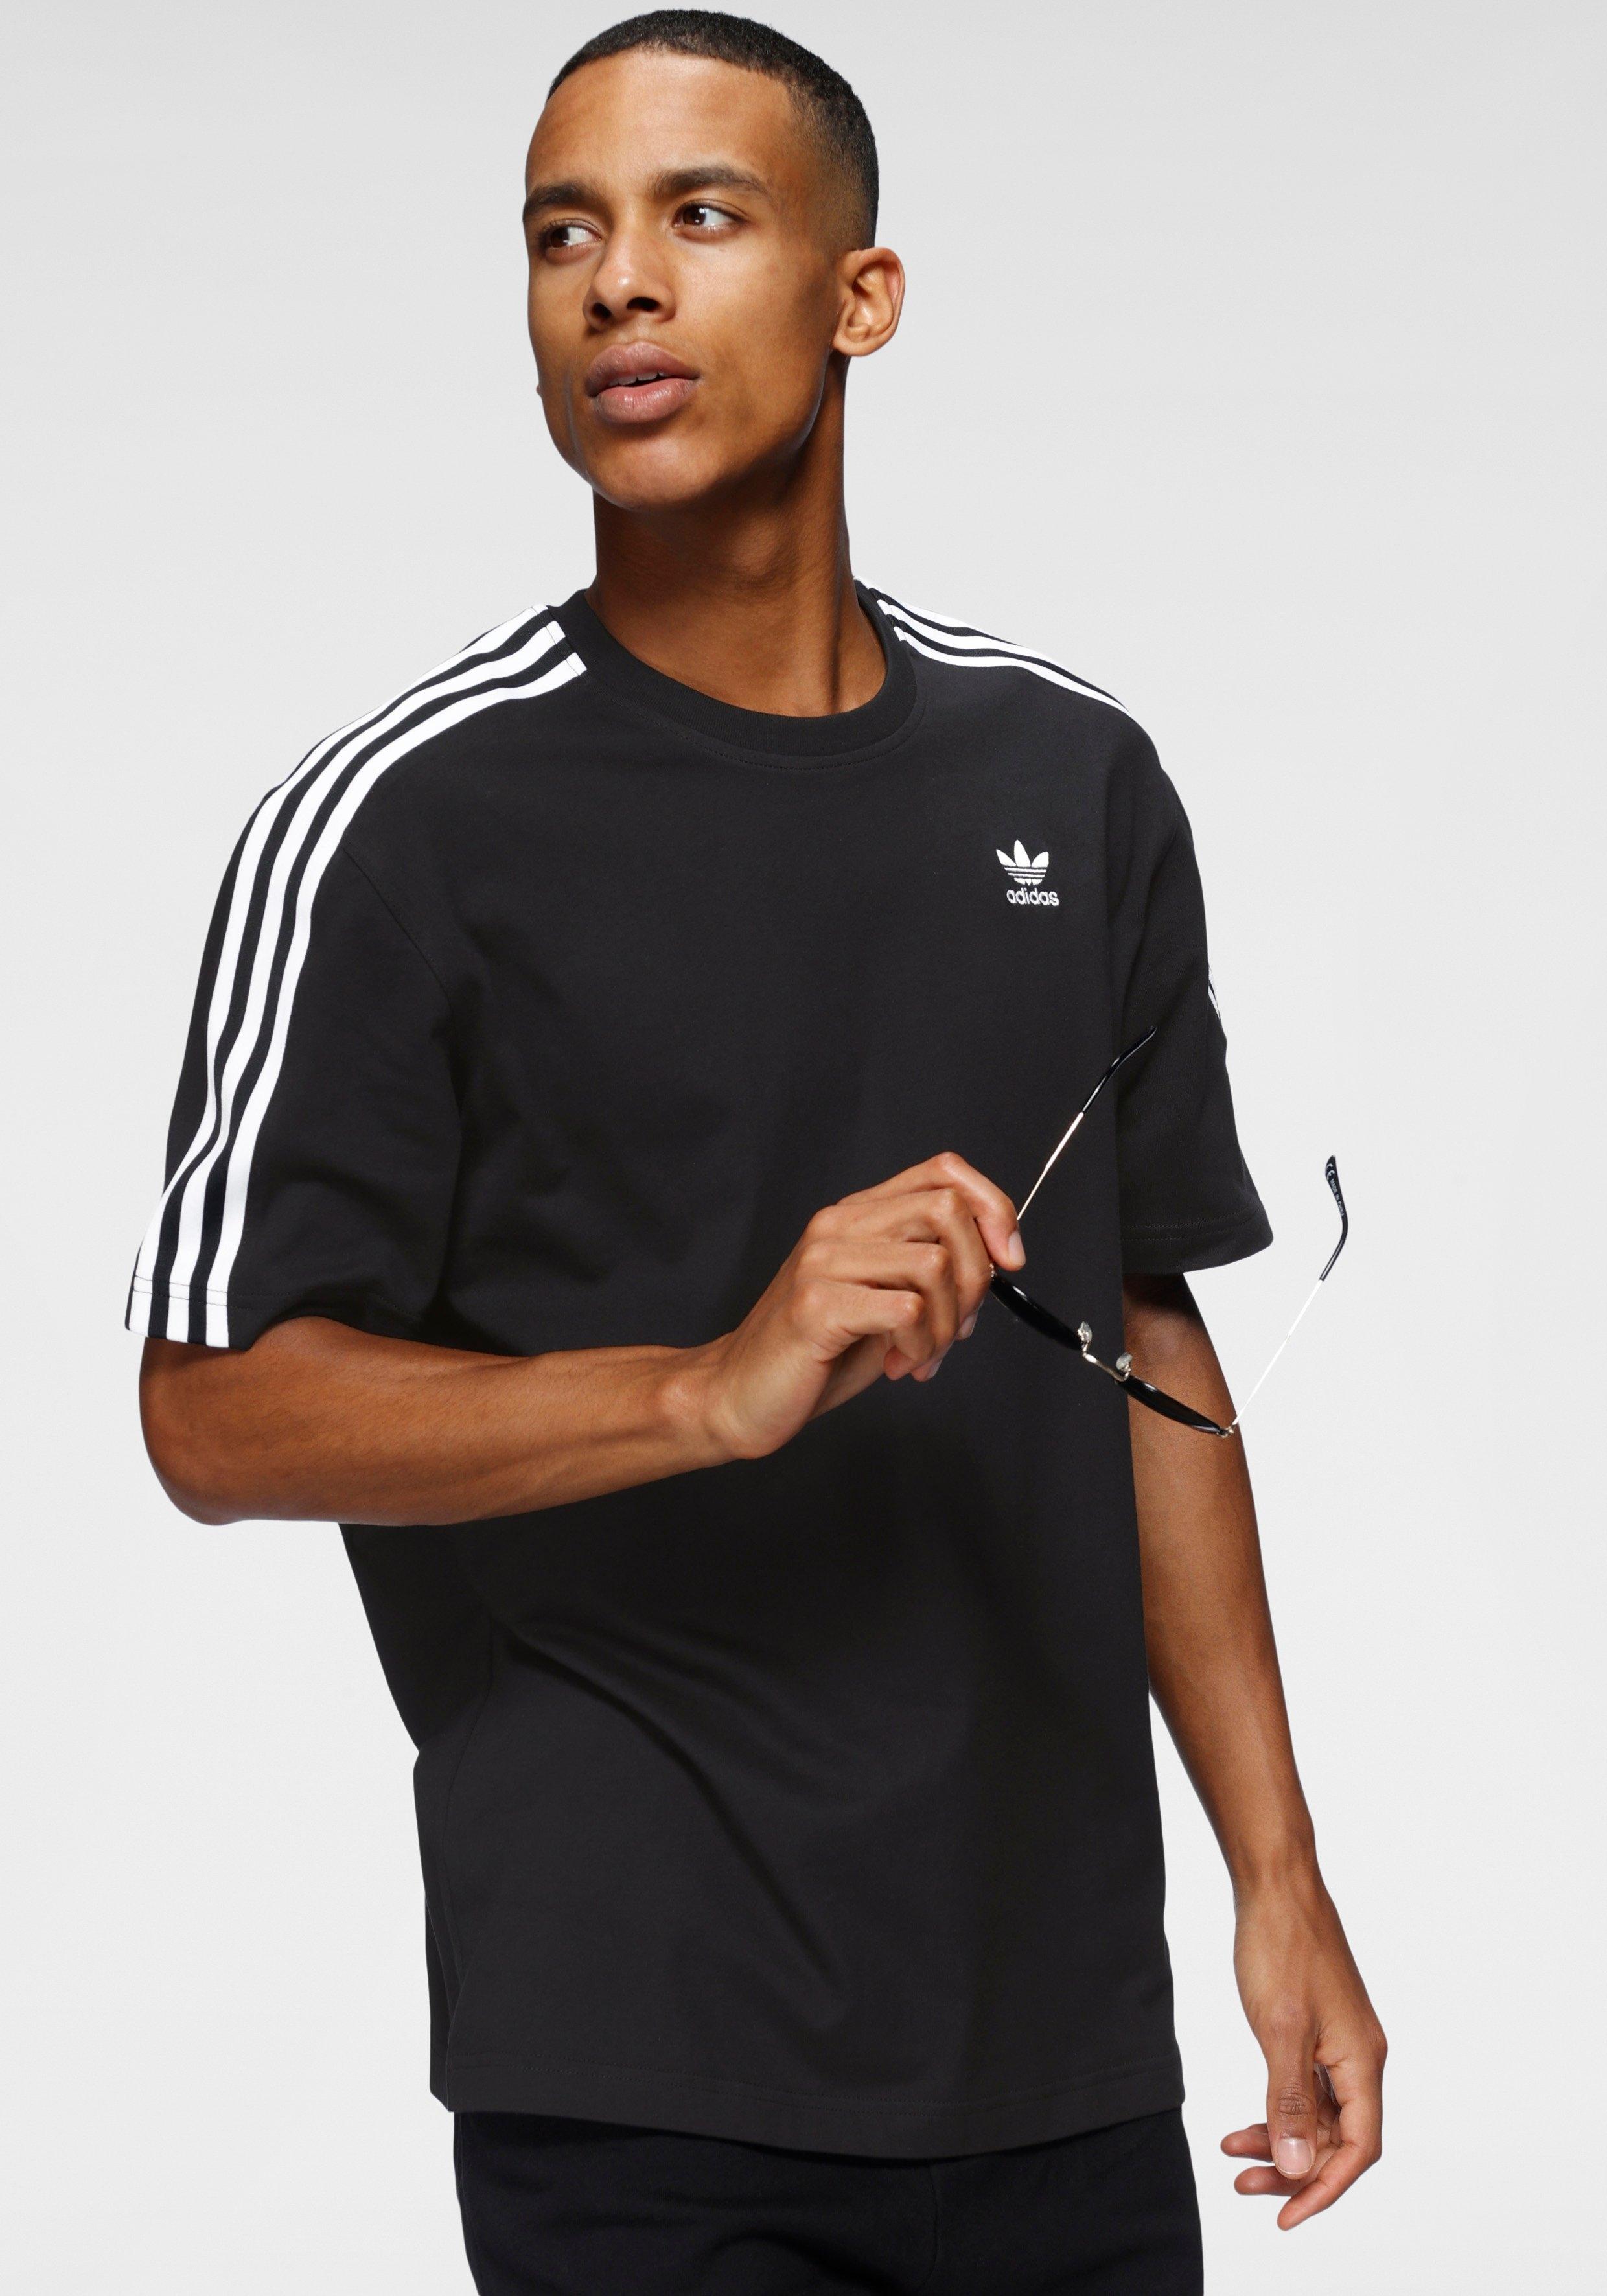 adidas Originals T-shirt »ADICOLOR 3D TREFOIL 3-STREIFEN« - gratis ruilen op otto.nl